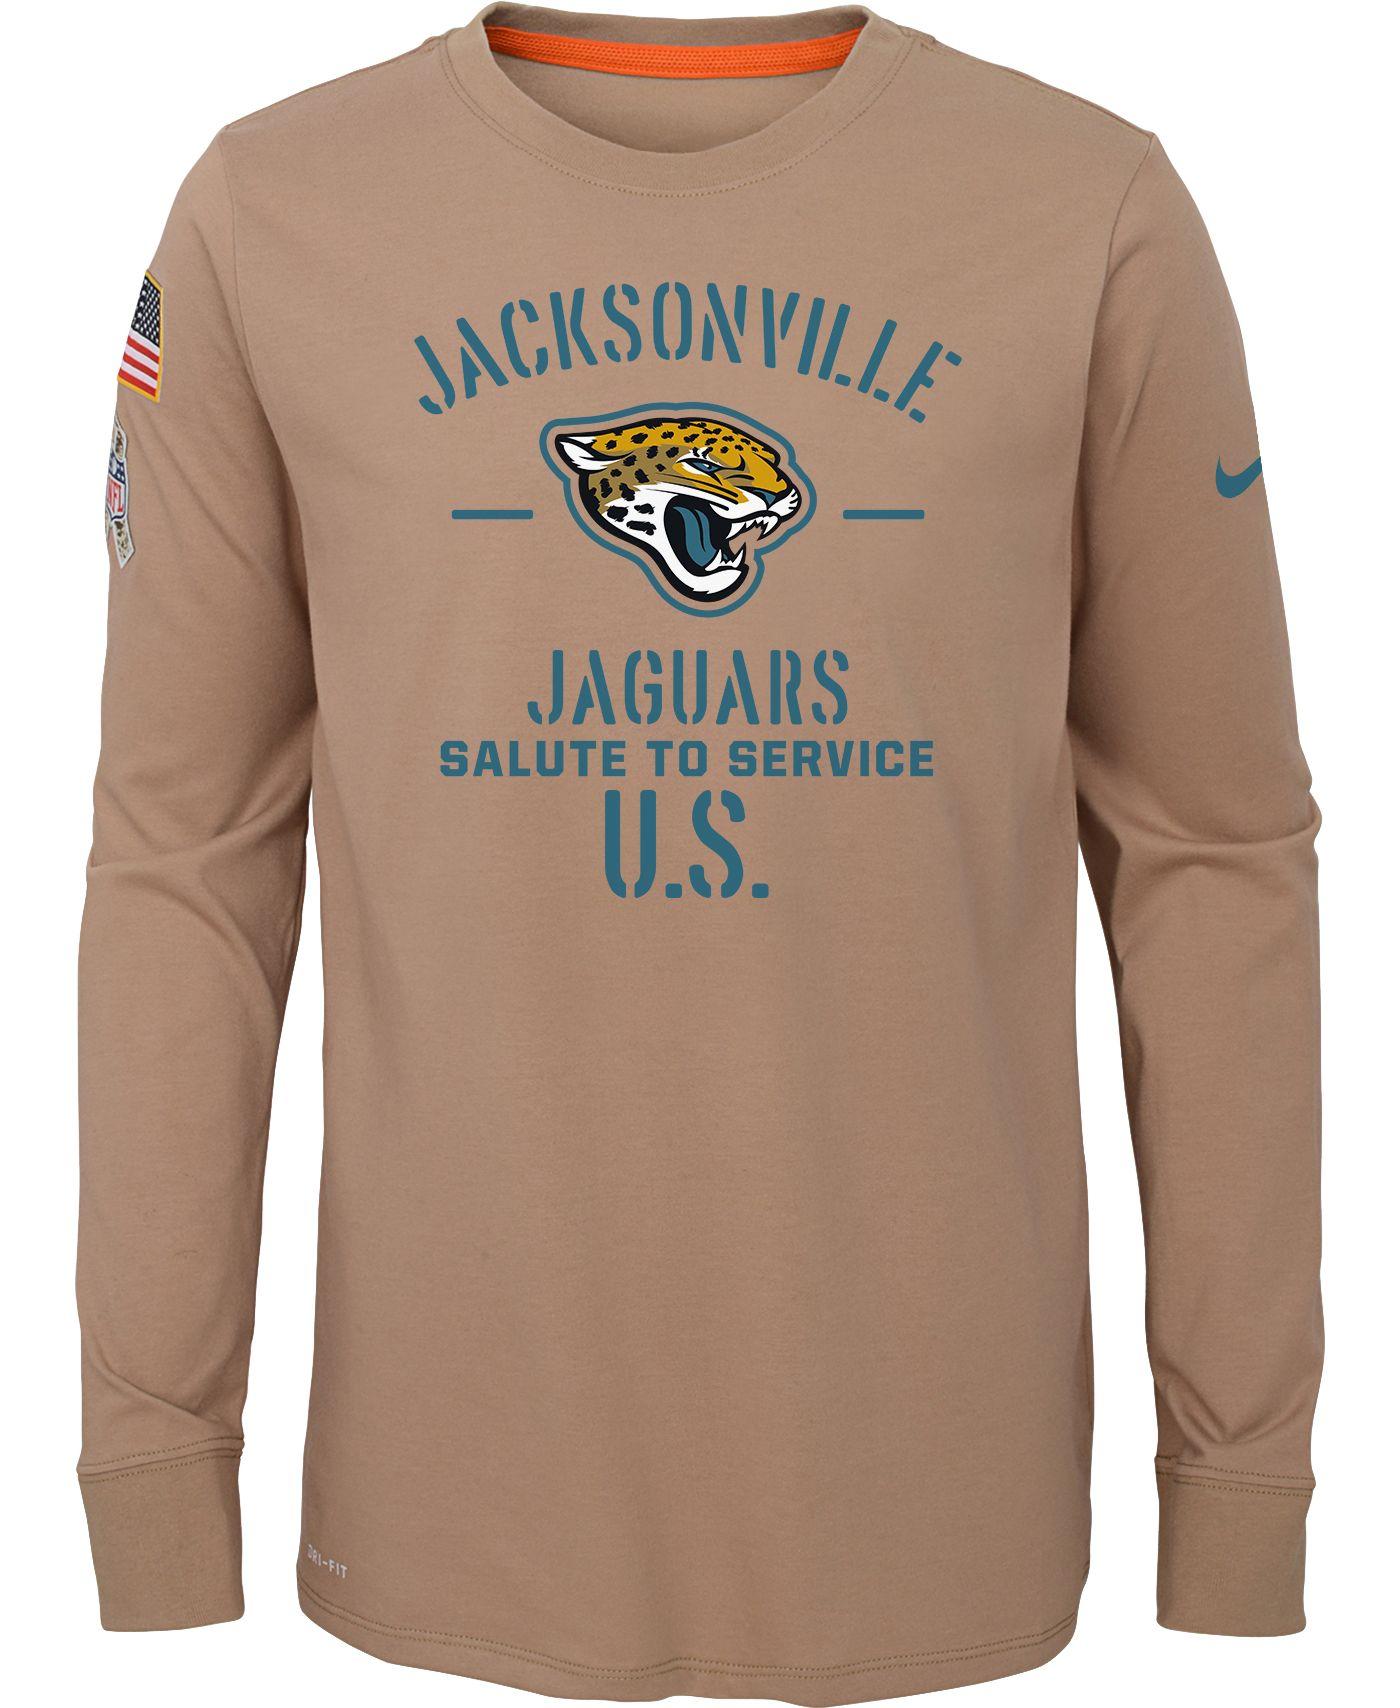 Nike Youth Salute to Service Jacksonville Jaguars Dri-FIT Beige Long Sleeve Shirt